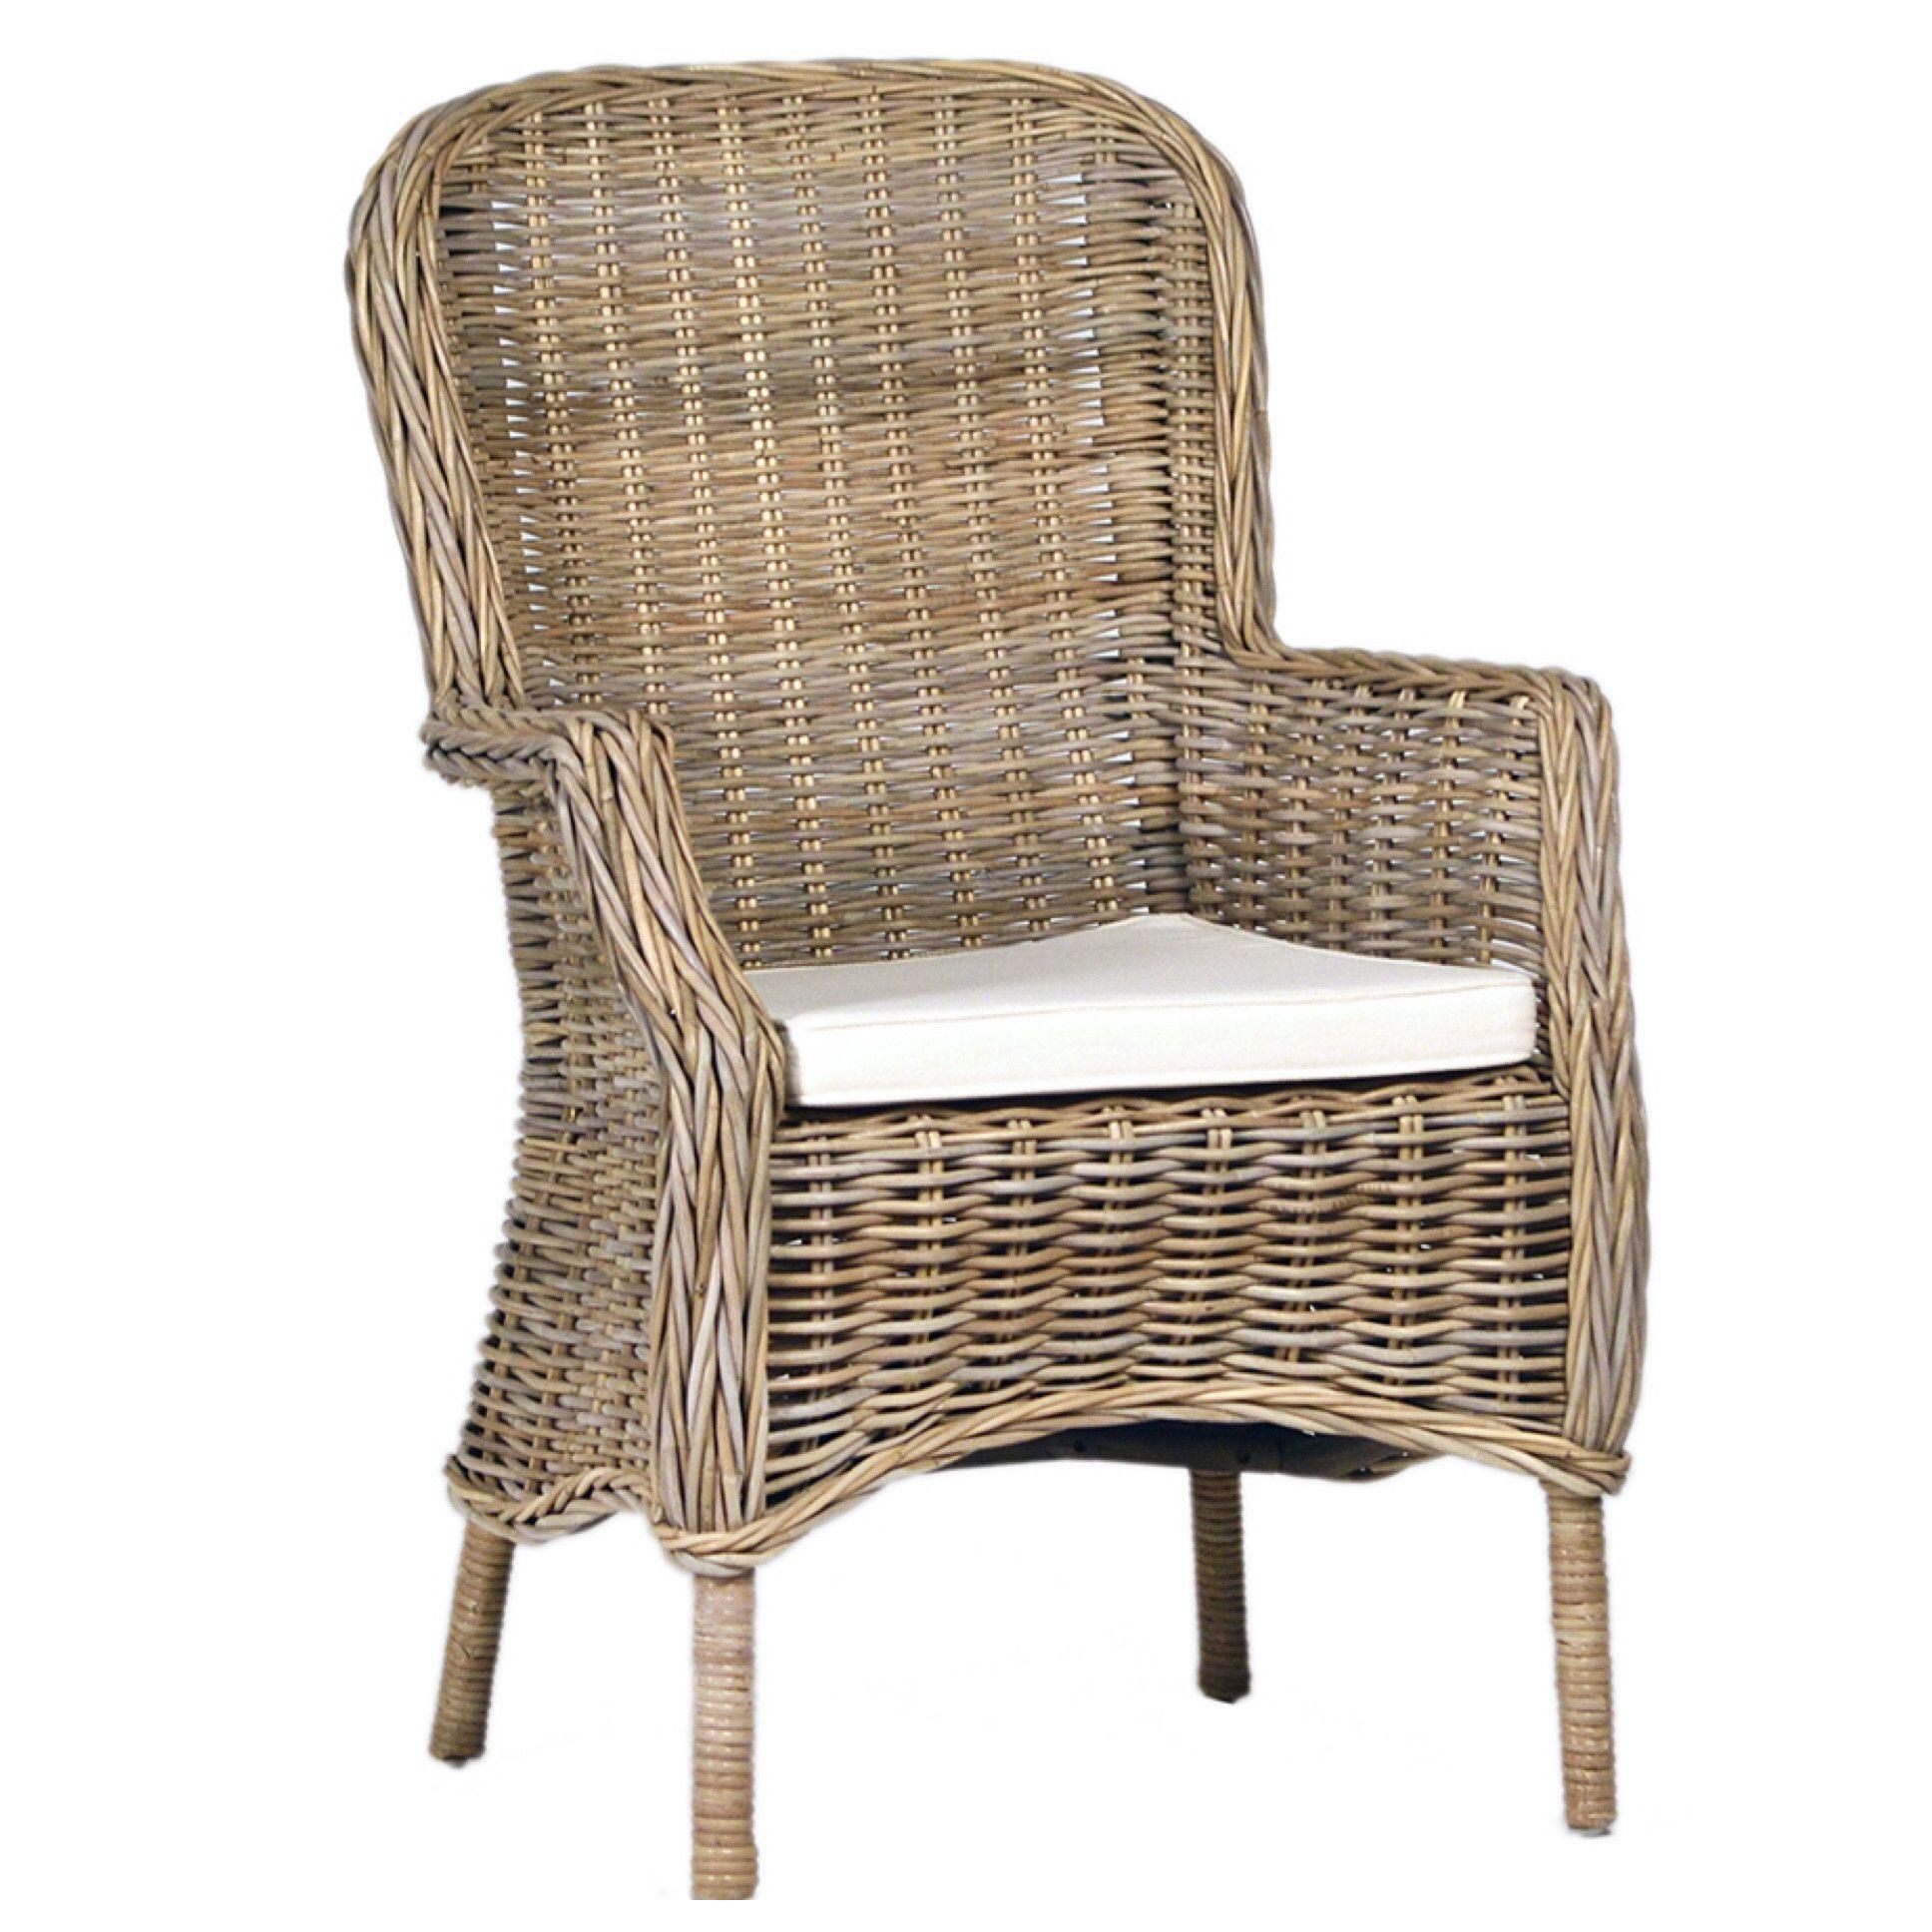 Kannen arm chair armchair chair armchair rattan